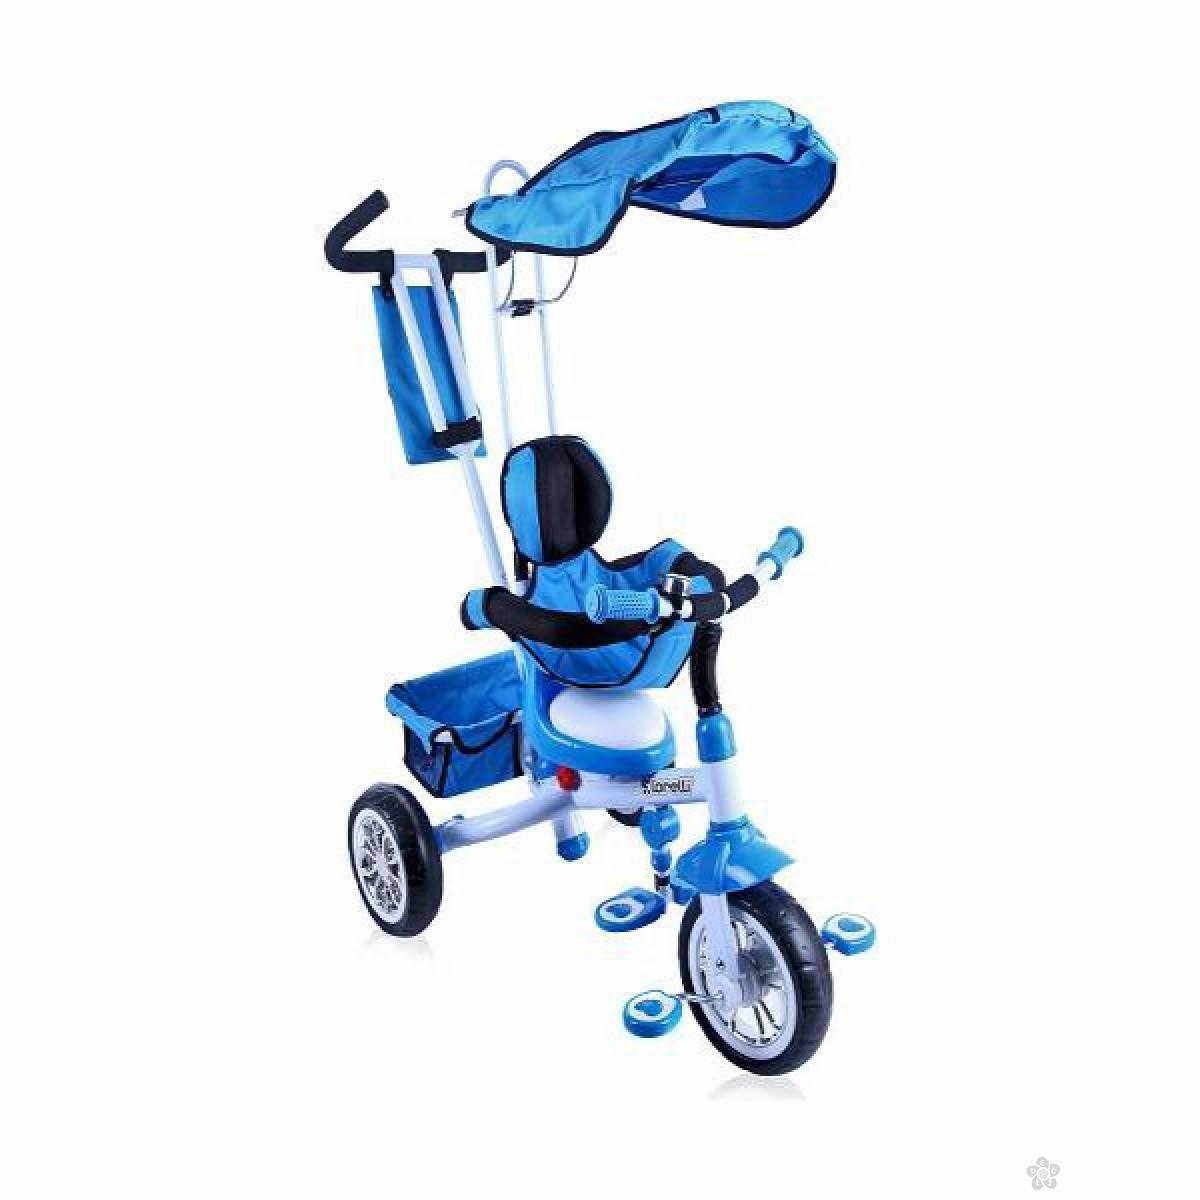 Dečiji Tricikl B301B Blue & White, 10050101606